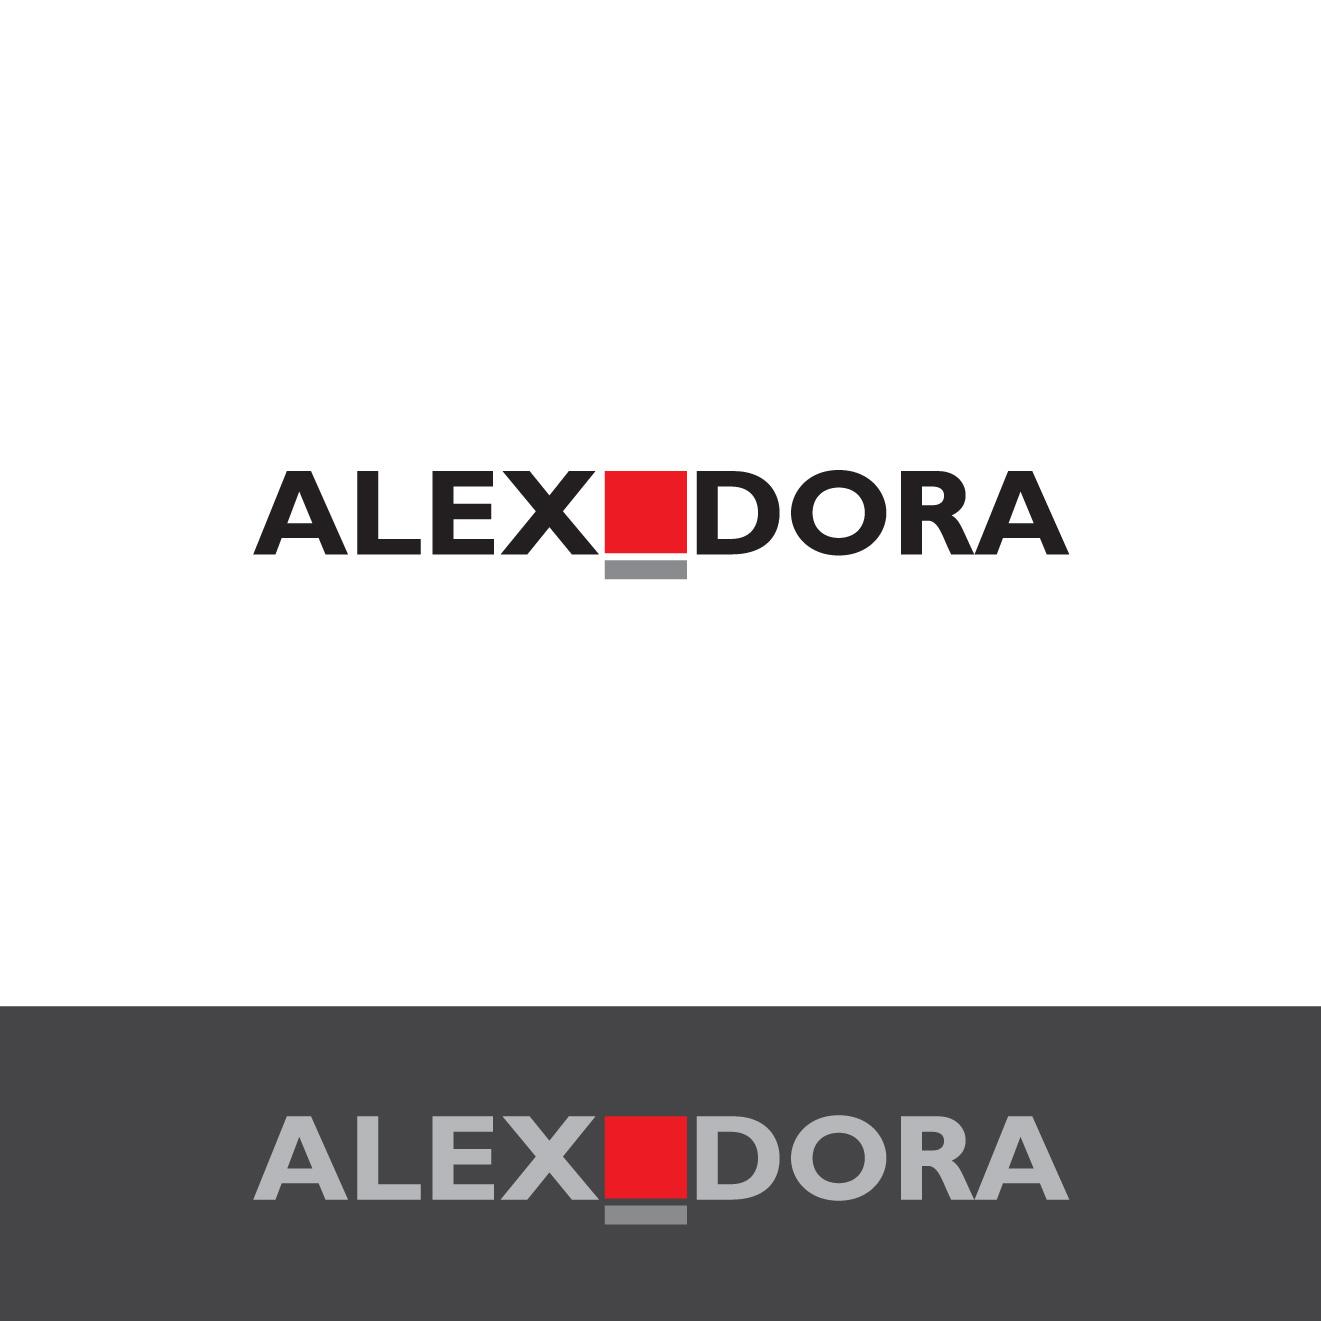 Необходим дизайнер для доработки логотипа бренда одежды фото f_0465b3903f699c4f.jpg